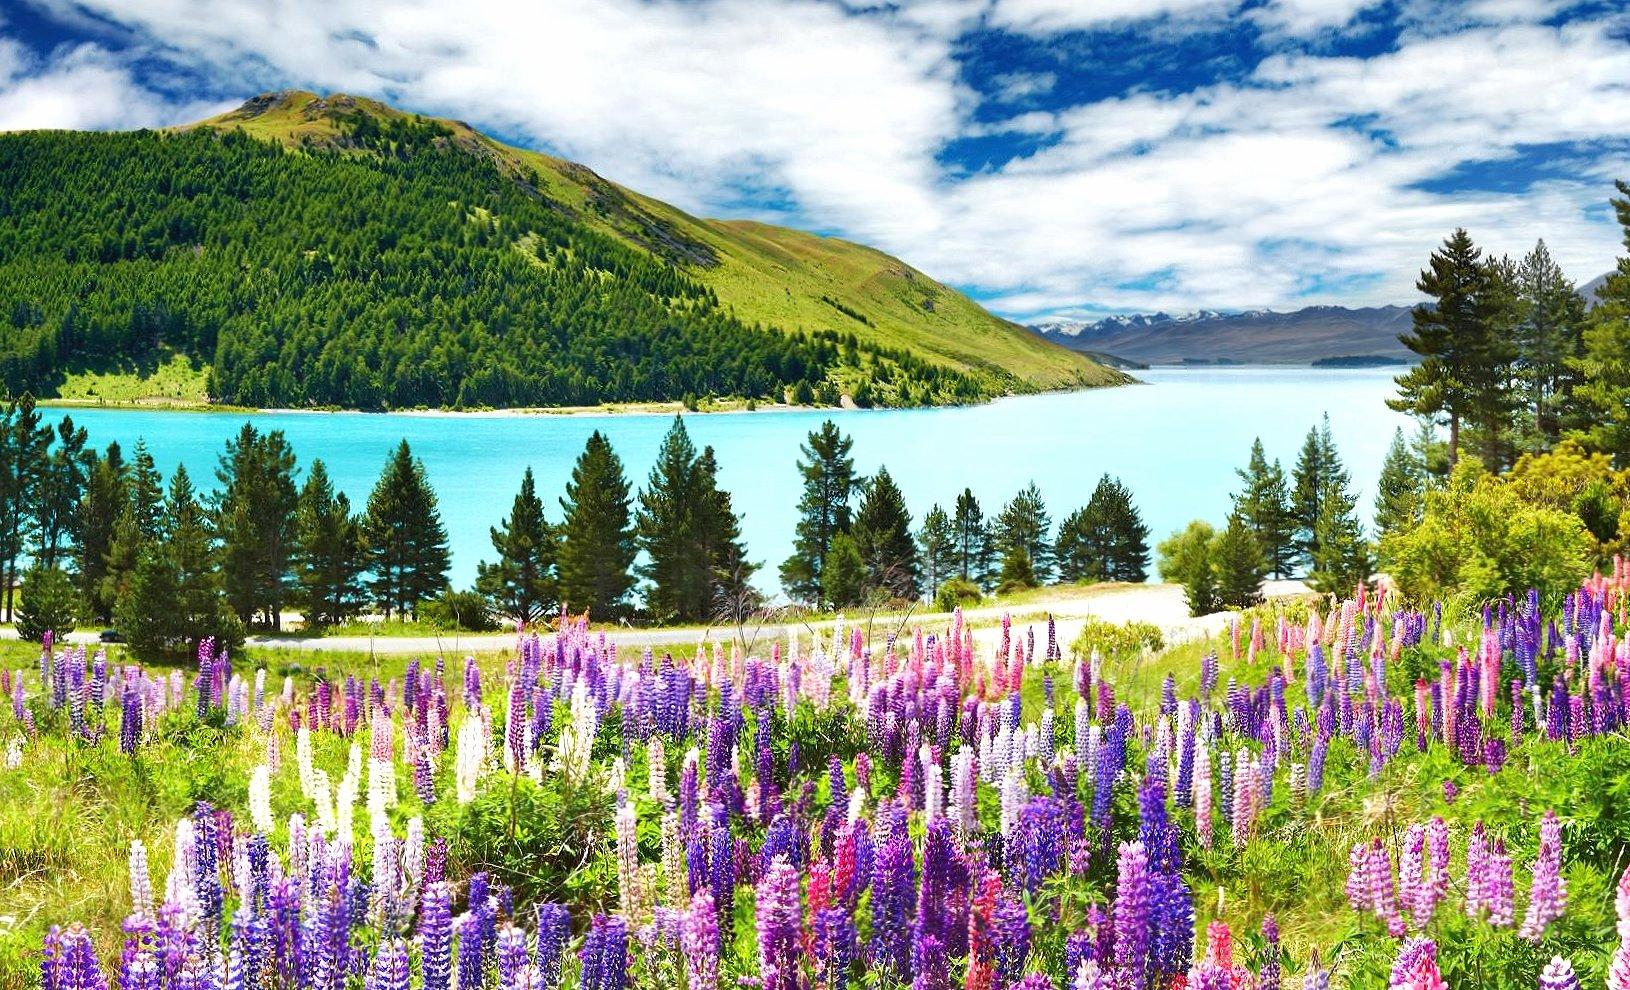 Mountain lake lavender wallpapers HD quality